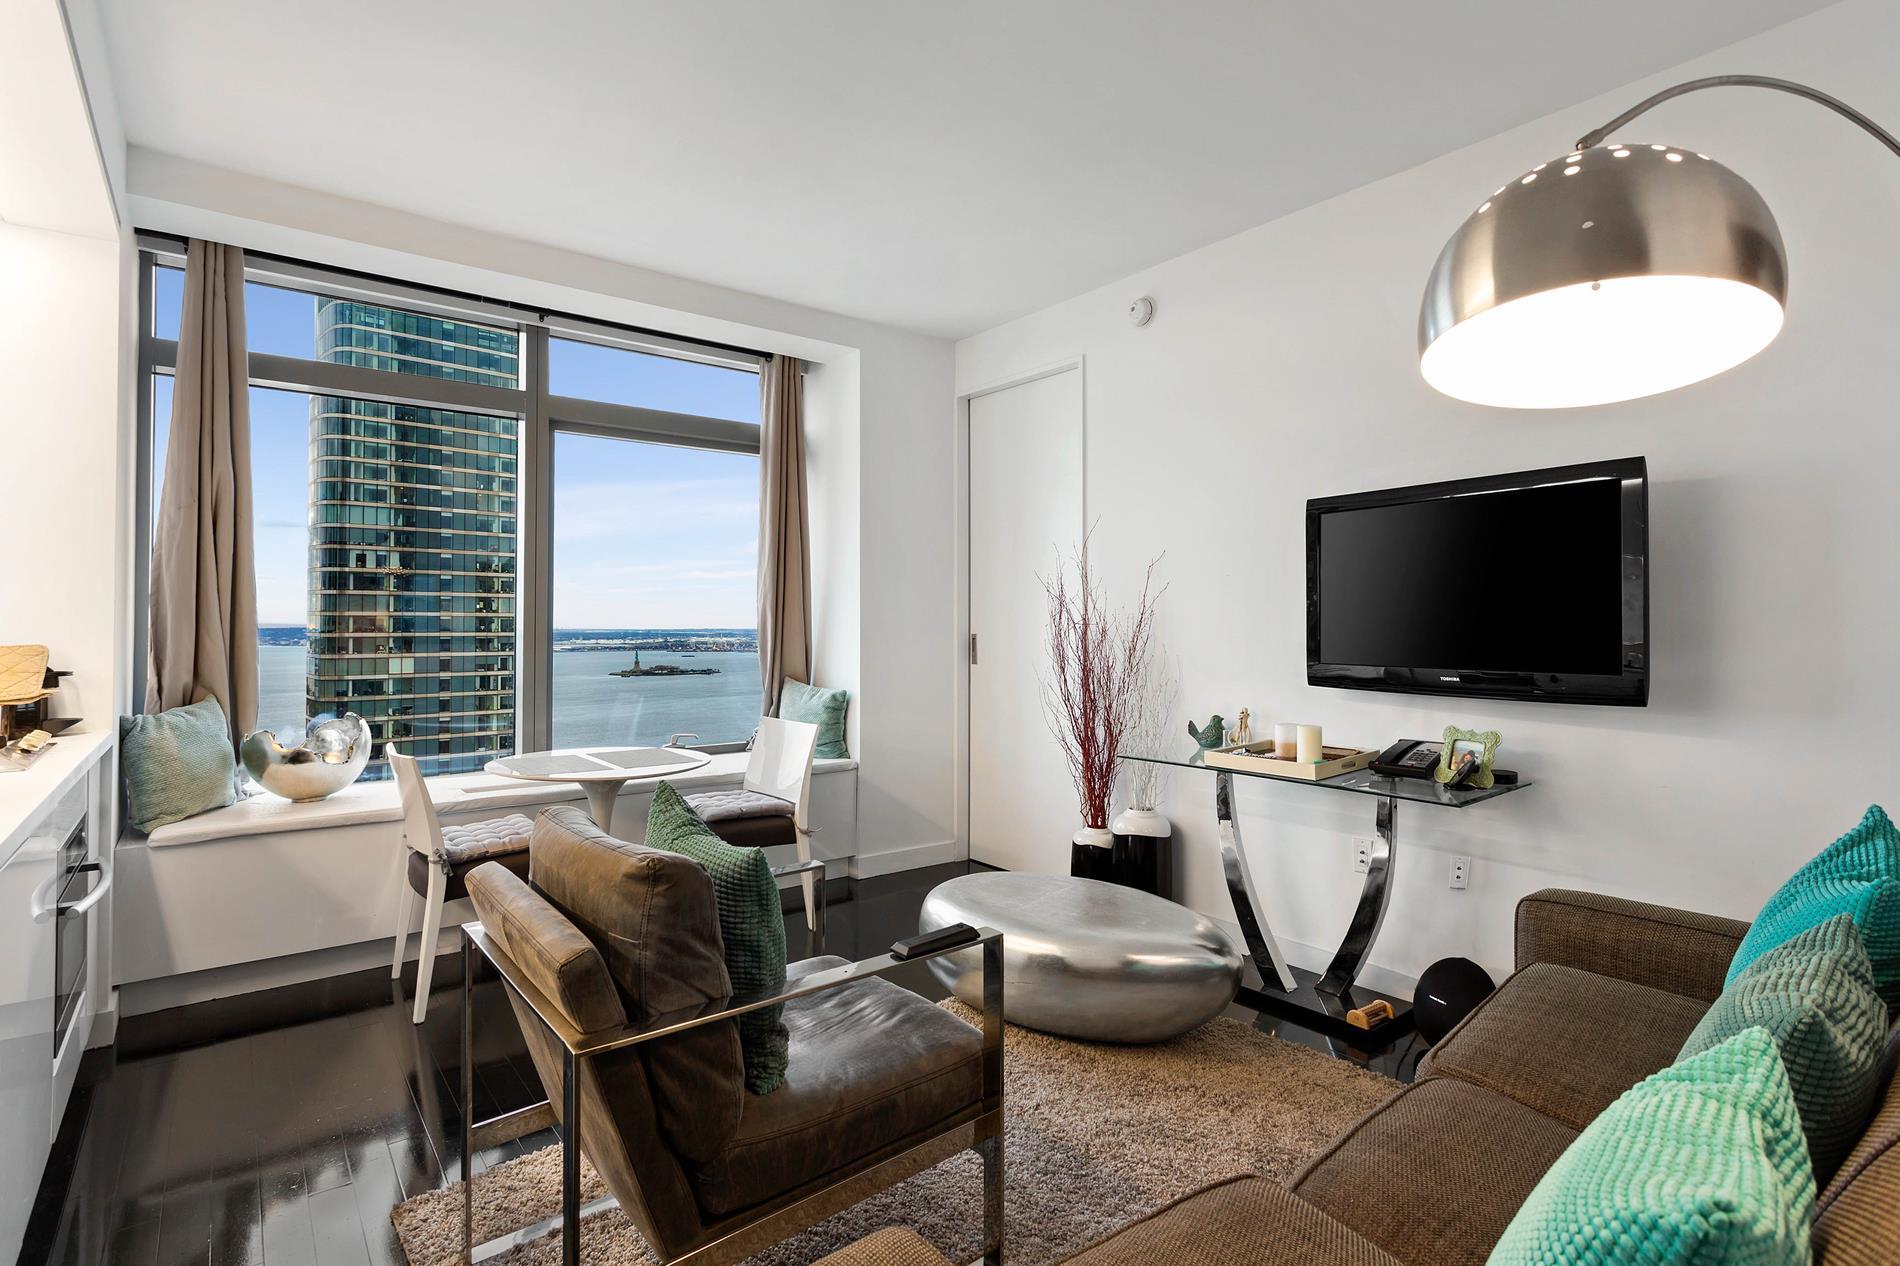 Apartment for sale at 123 Washington Street, Apt PH-54H